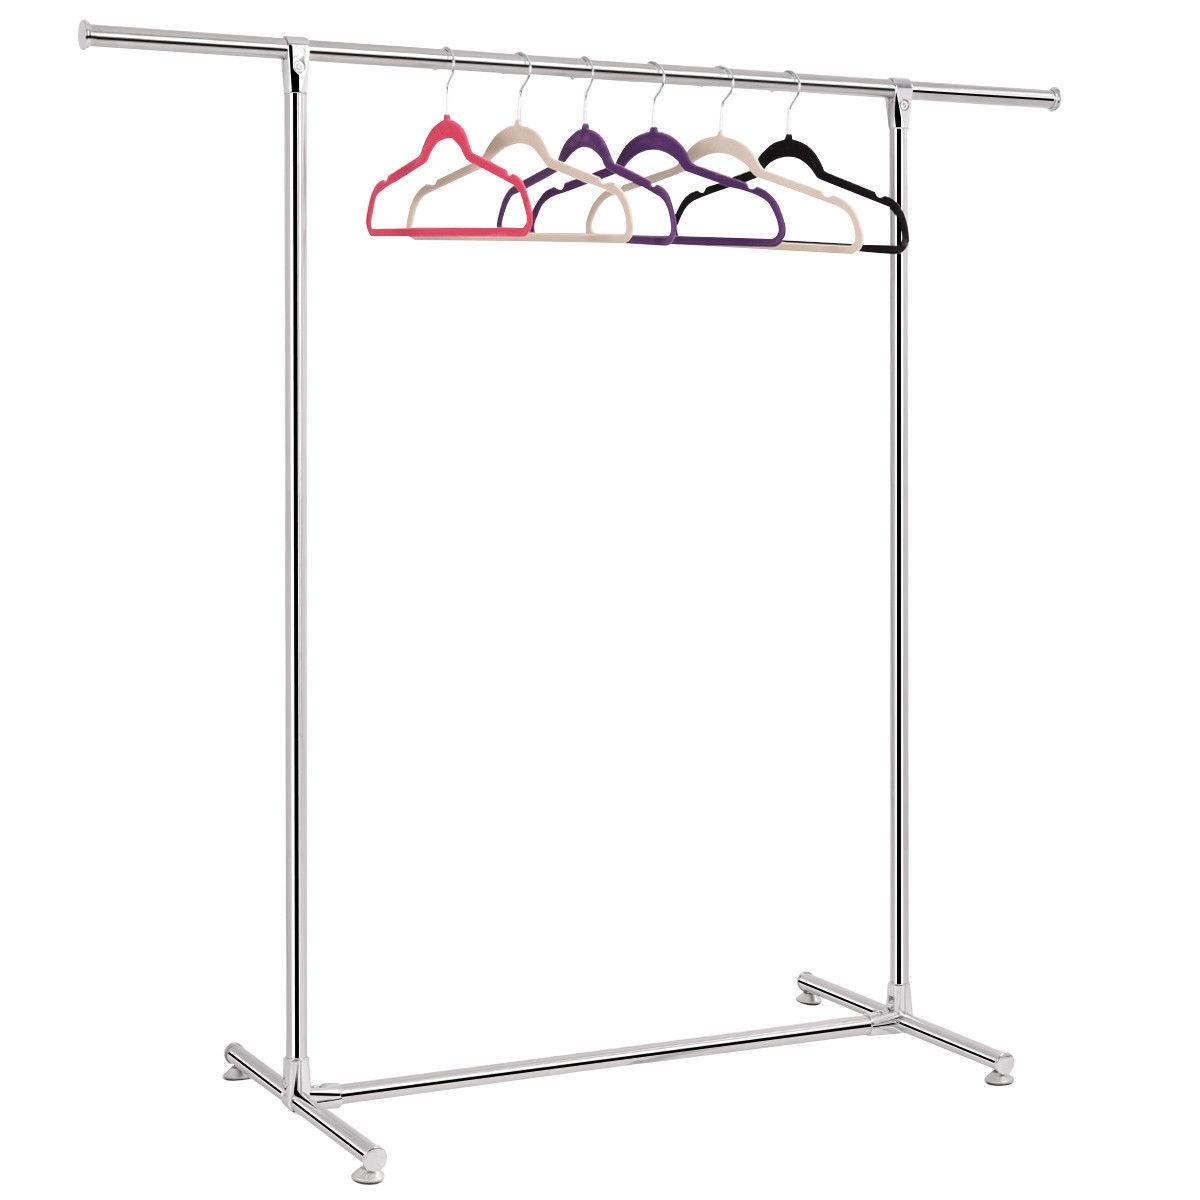 Heavy Duty Stainless Steel Garment Rack